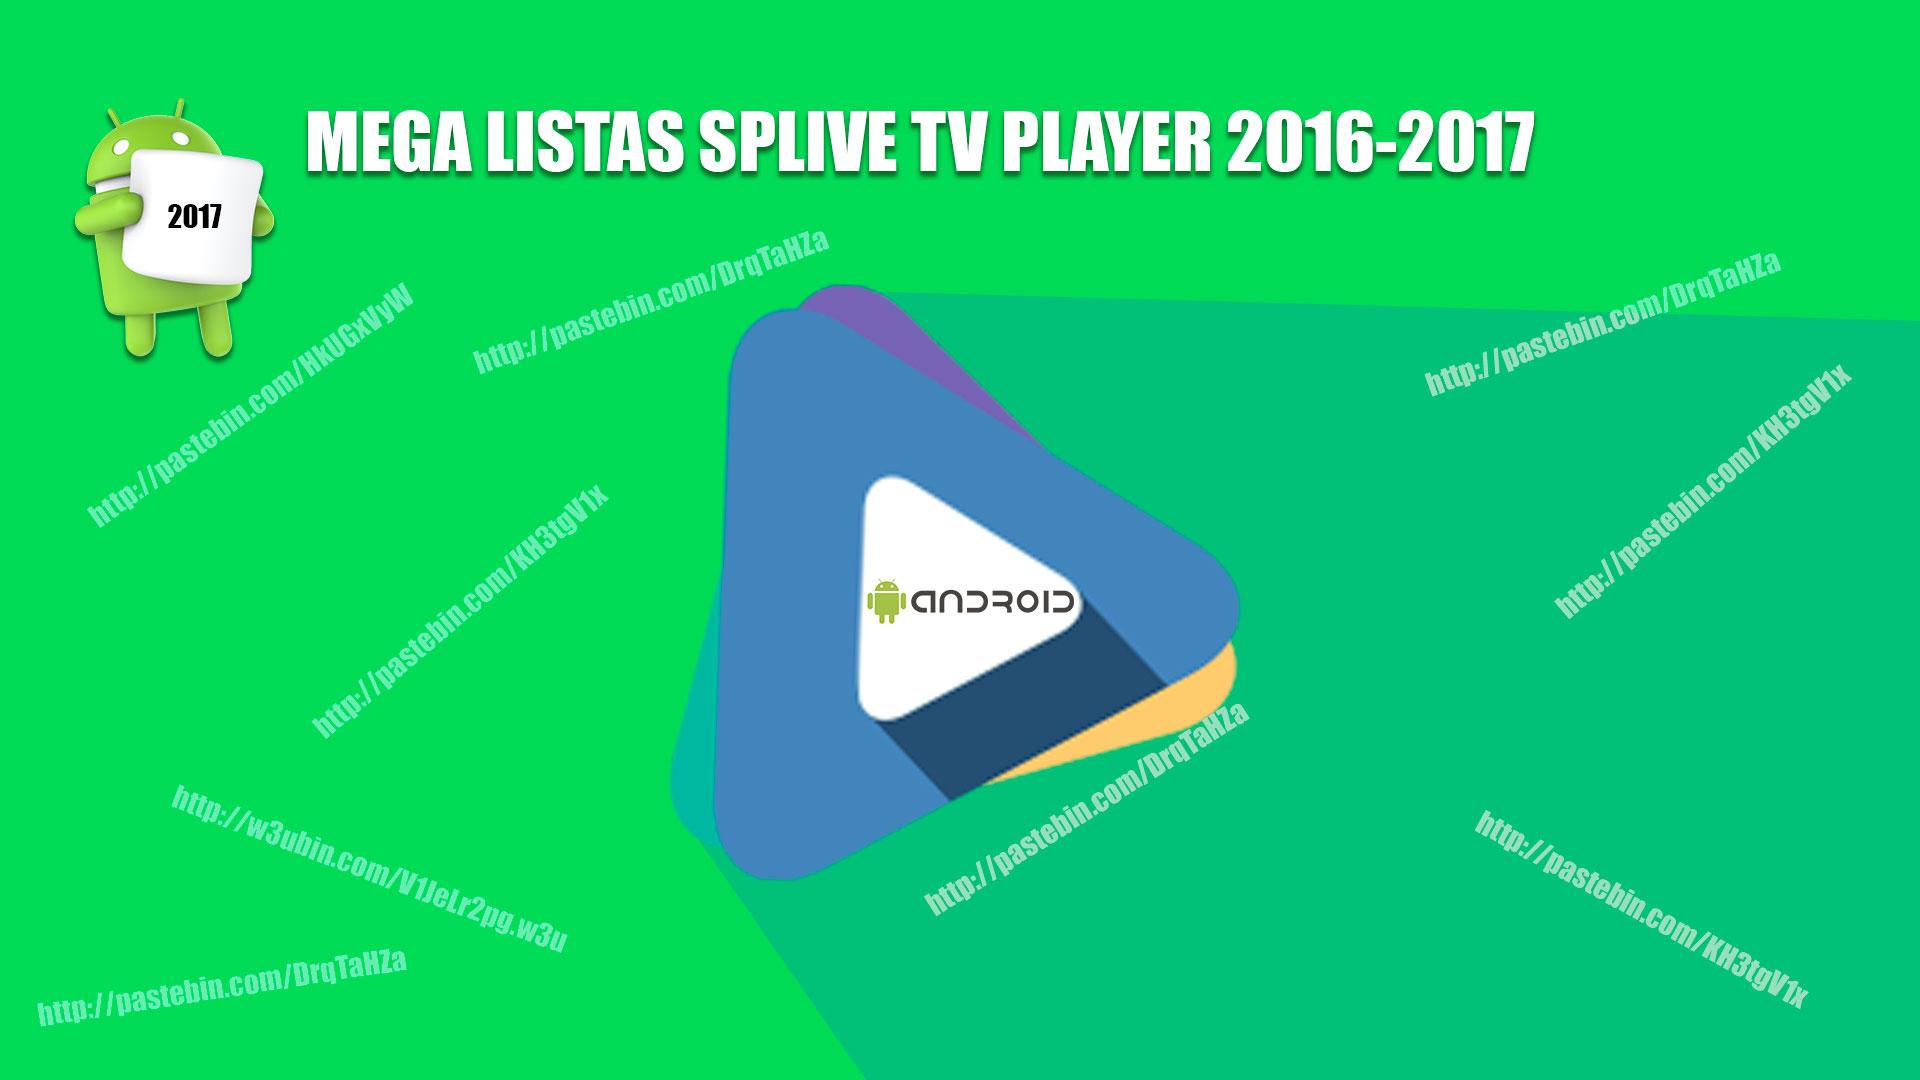 Listas Splive Tv Actualizadas 2016-2017 Megalista!